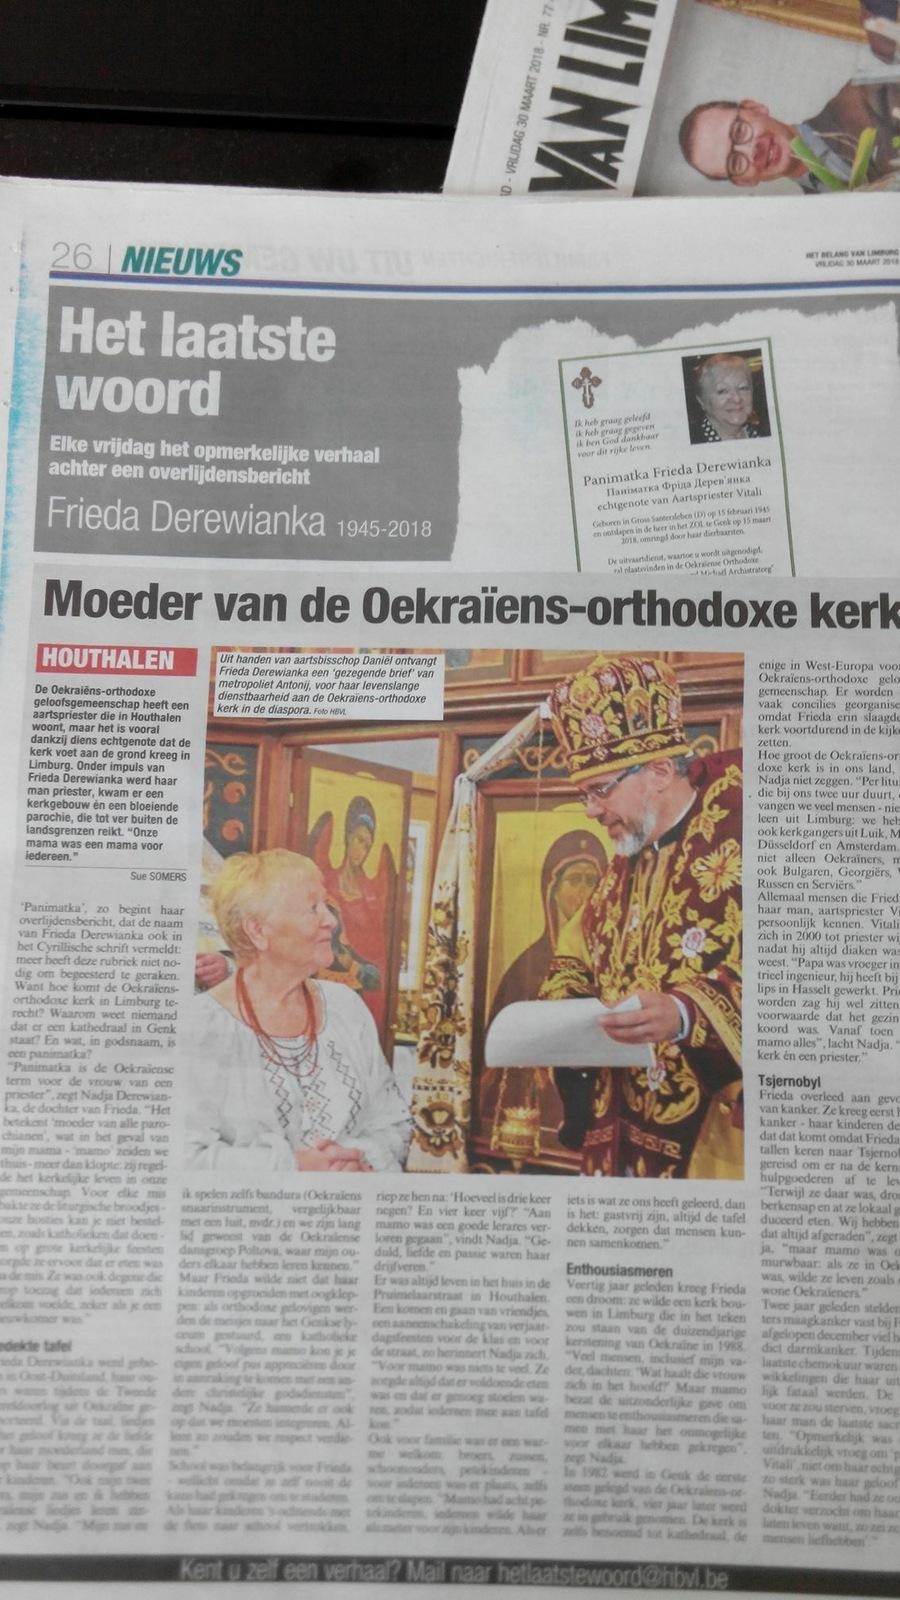 Ukrainian Orthodox Church of the USA - Pani-matka Frieda Derewianka